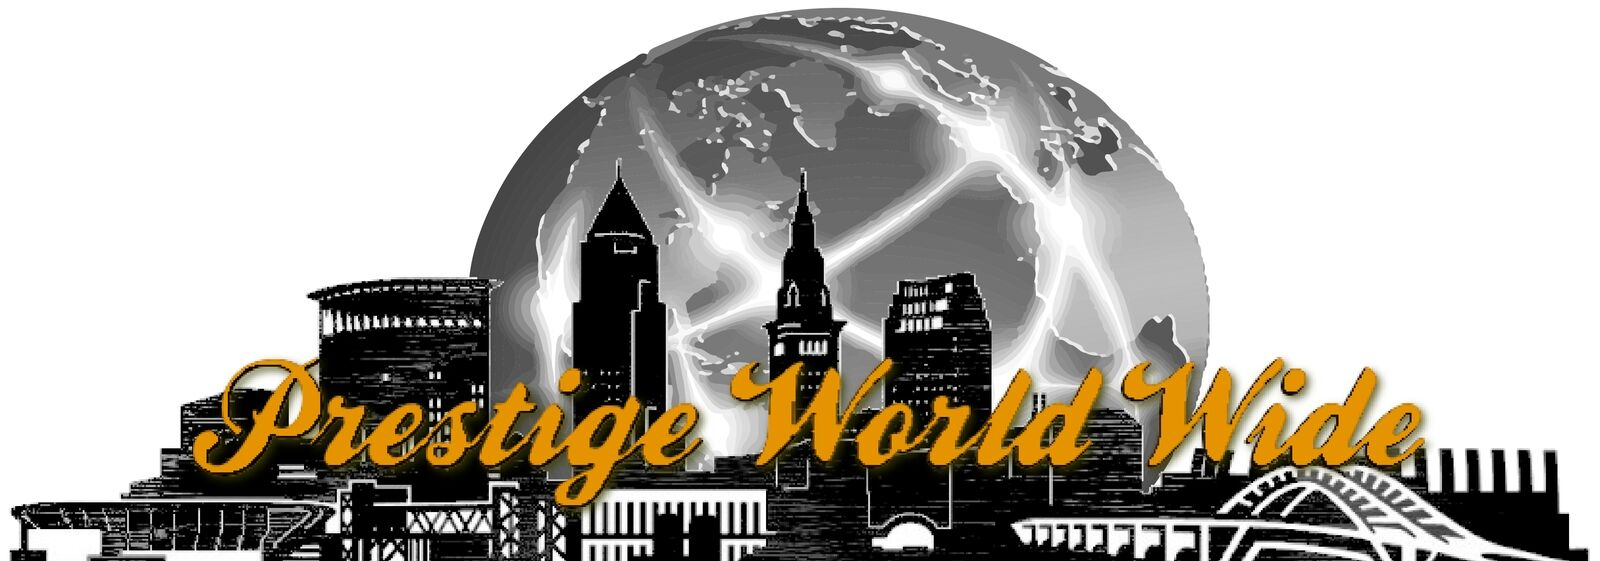 PWWCards - Prestige World Wide